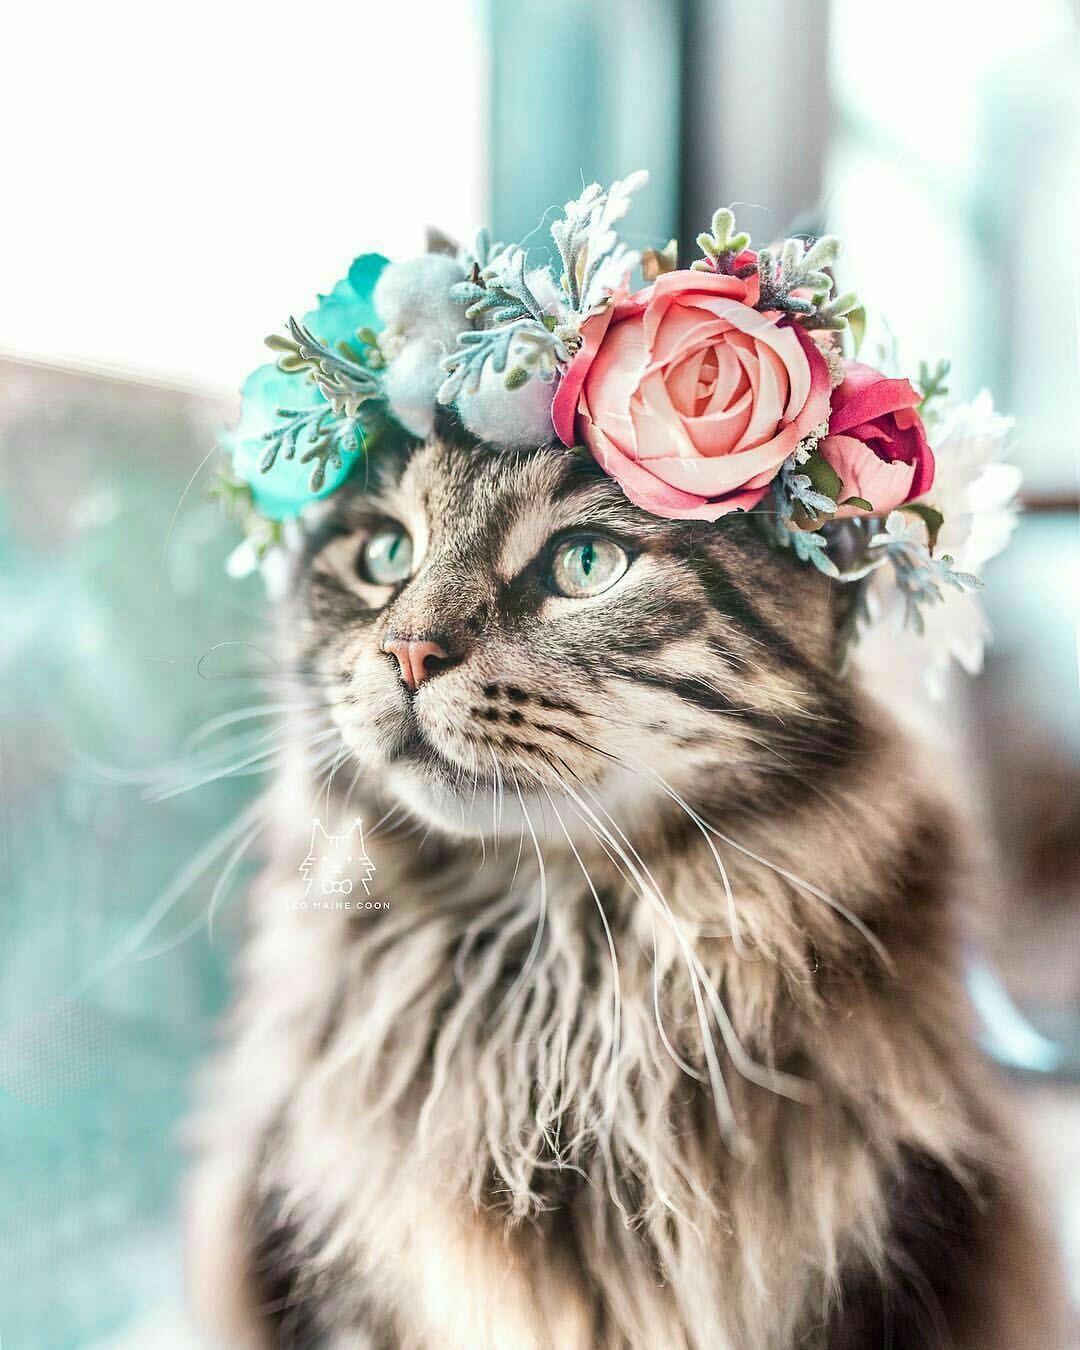 Pin by Sharon Larsen on Purrrr~fect  | Cats, Cute cats